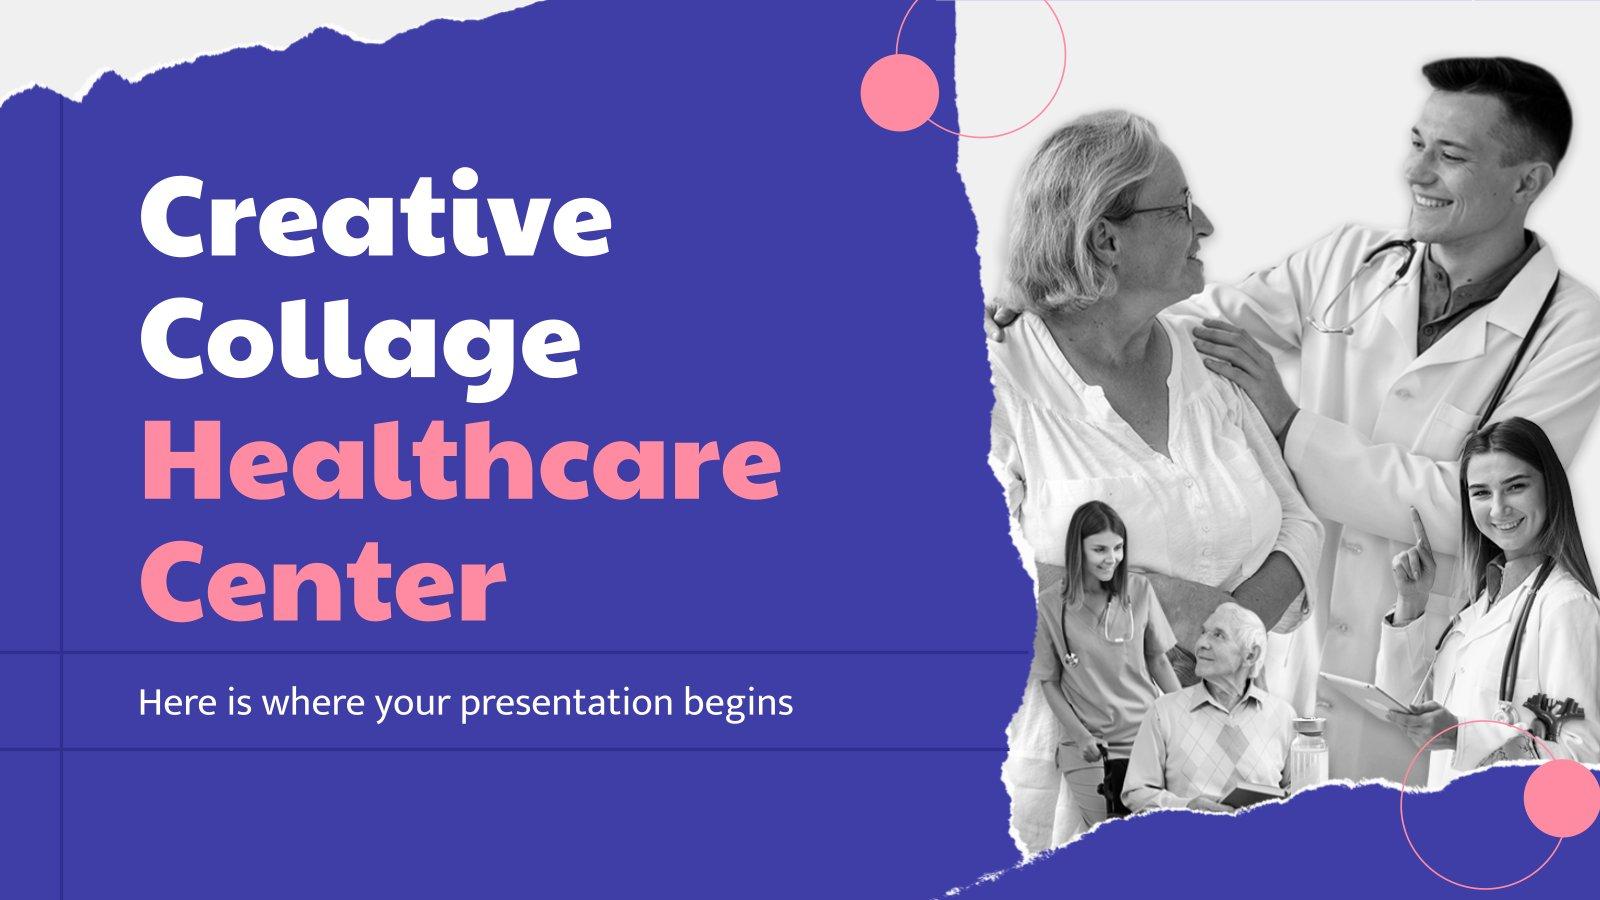 Creative Collage Healthcare Center presentation template